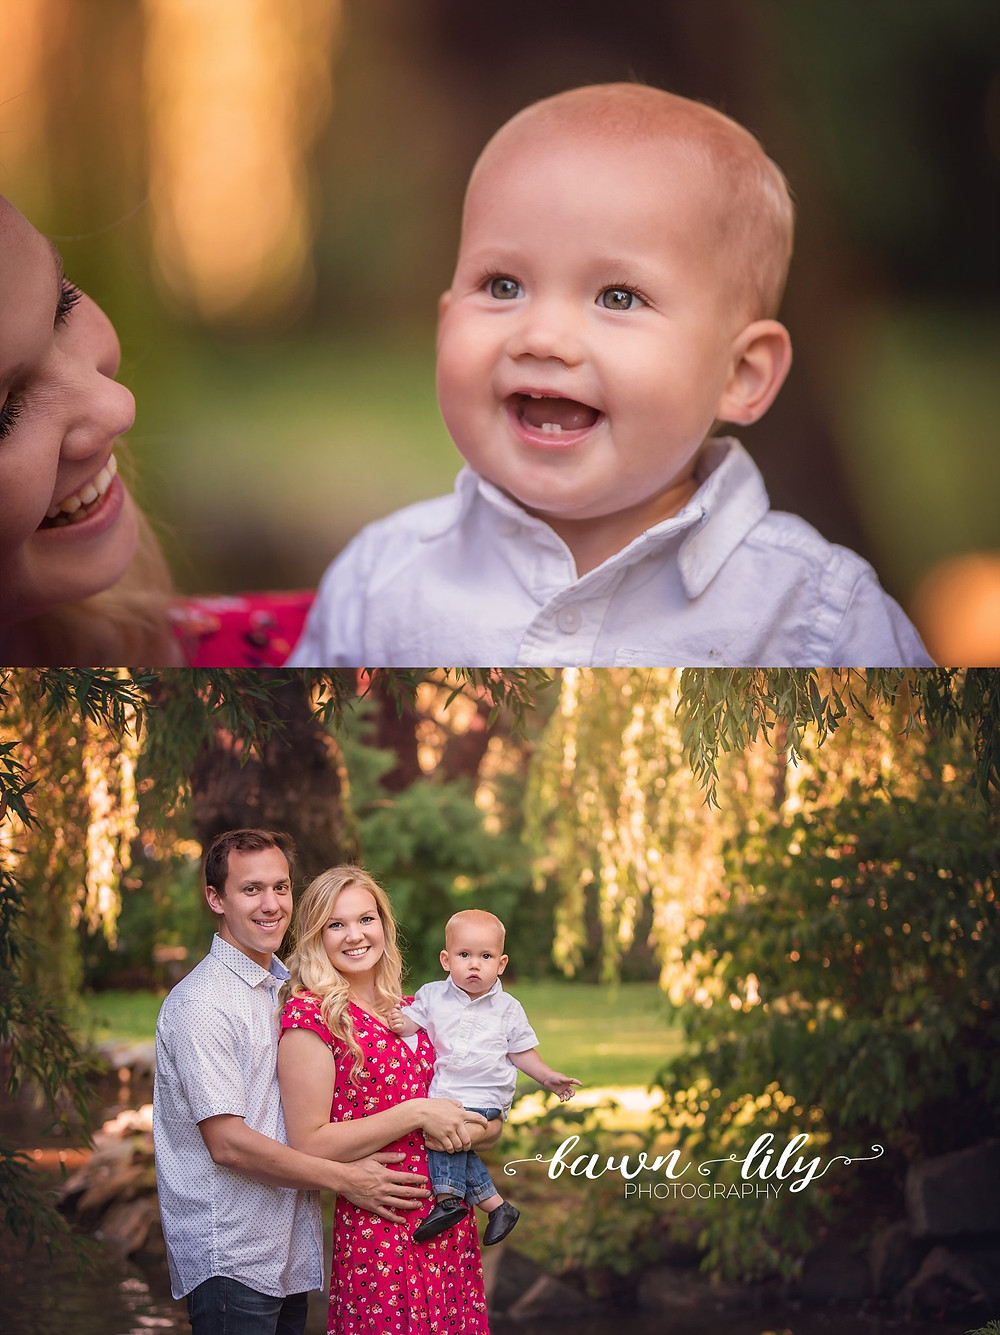 Baby smiles, Family photographer Victoria BC, Sidney BC family photographer